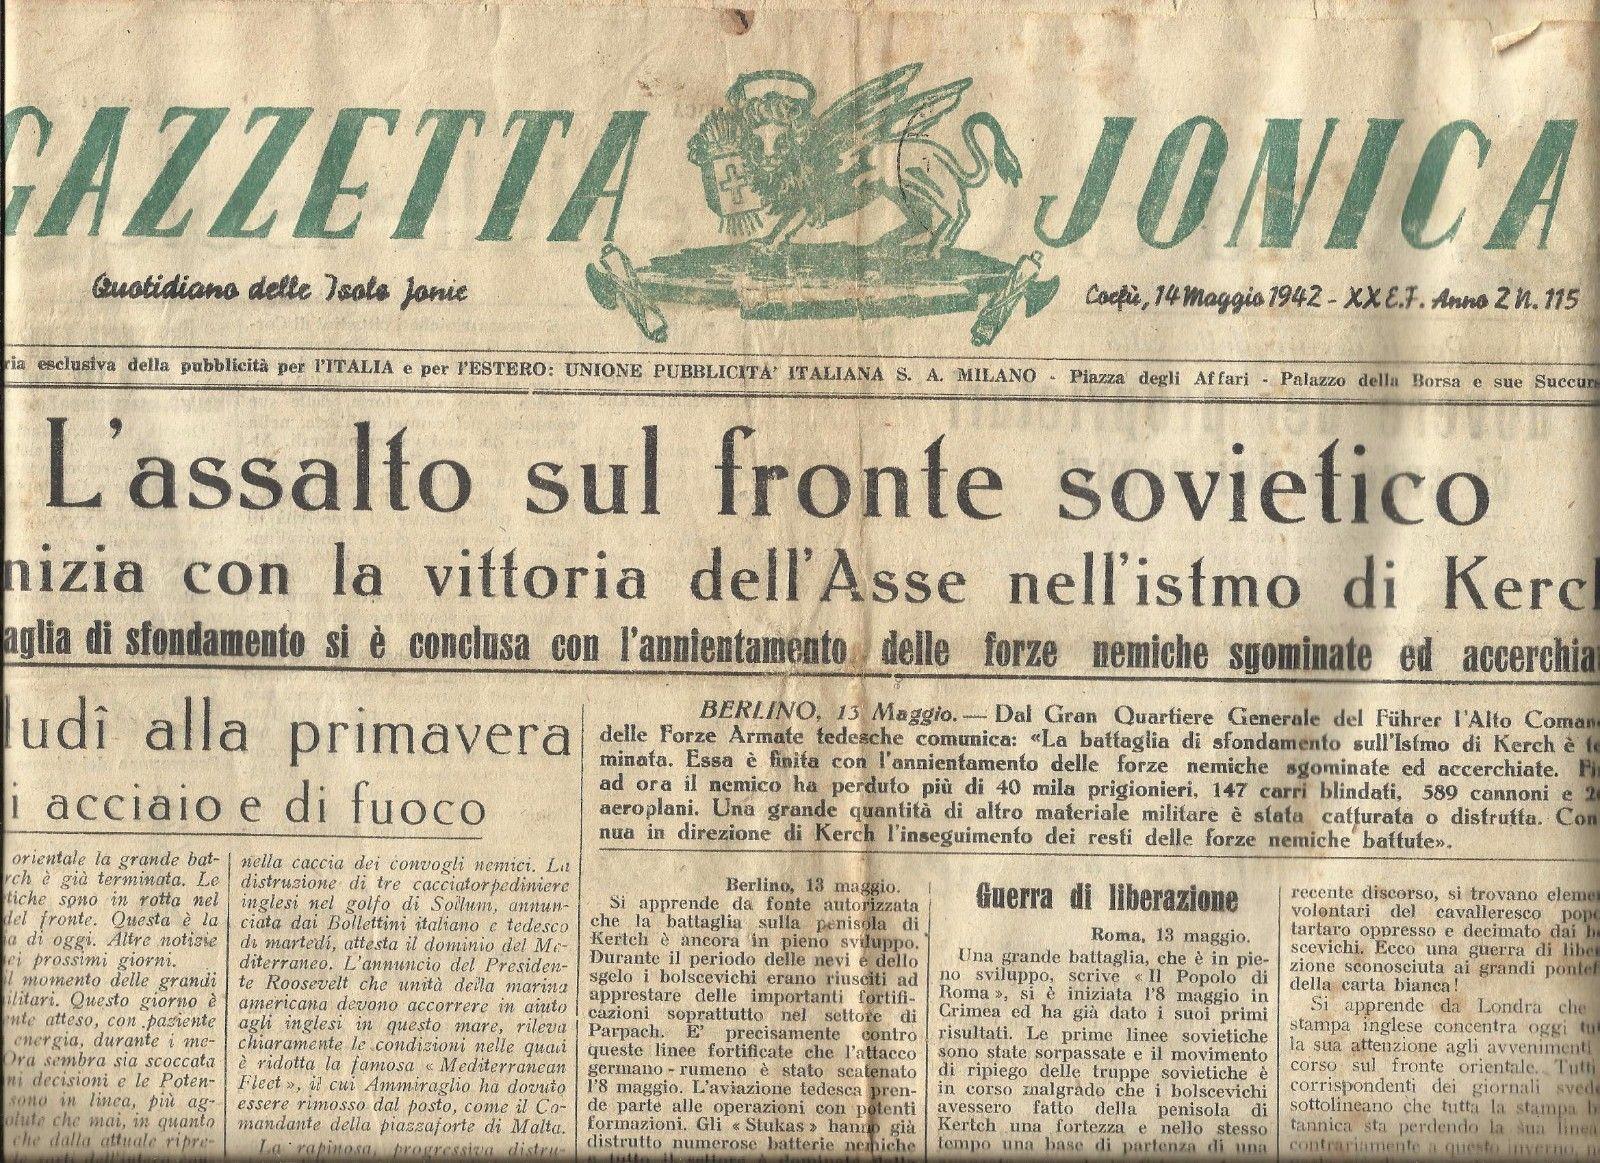 «Gazzetta Jonica». Προπαγανδιστική εφημερίδα που εκδίδονταν στην Κέρκυρα